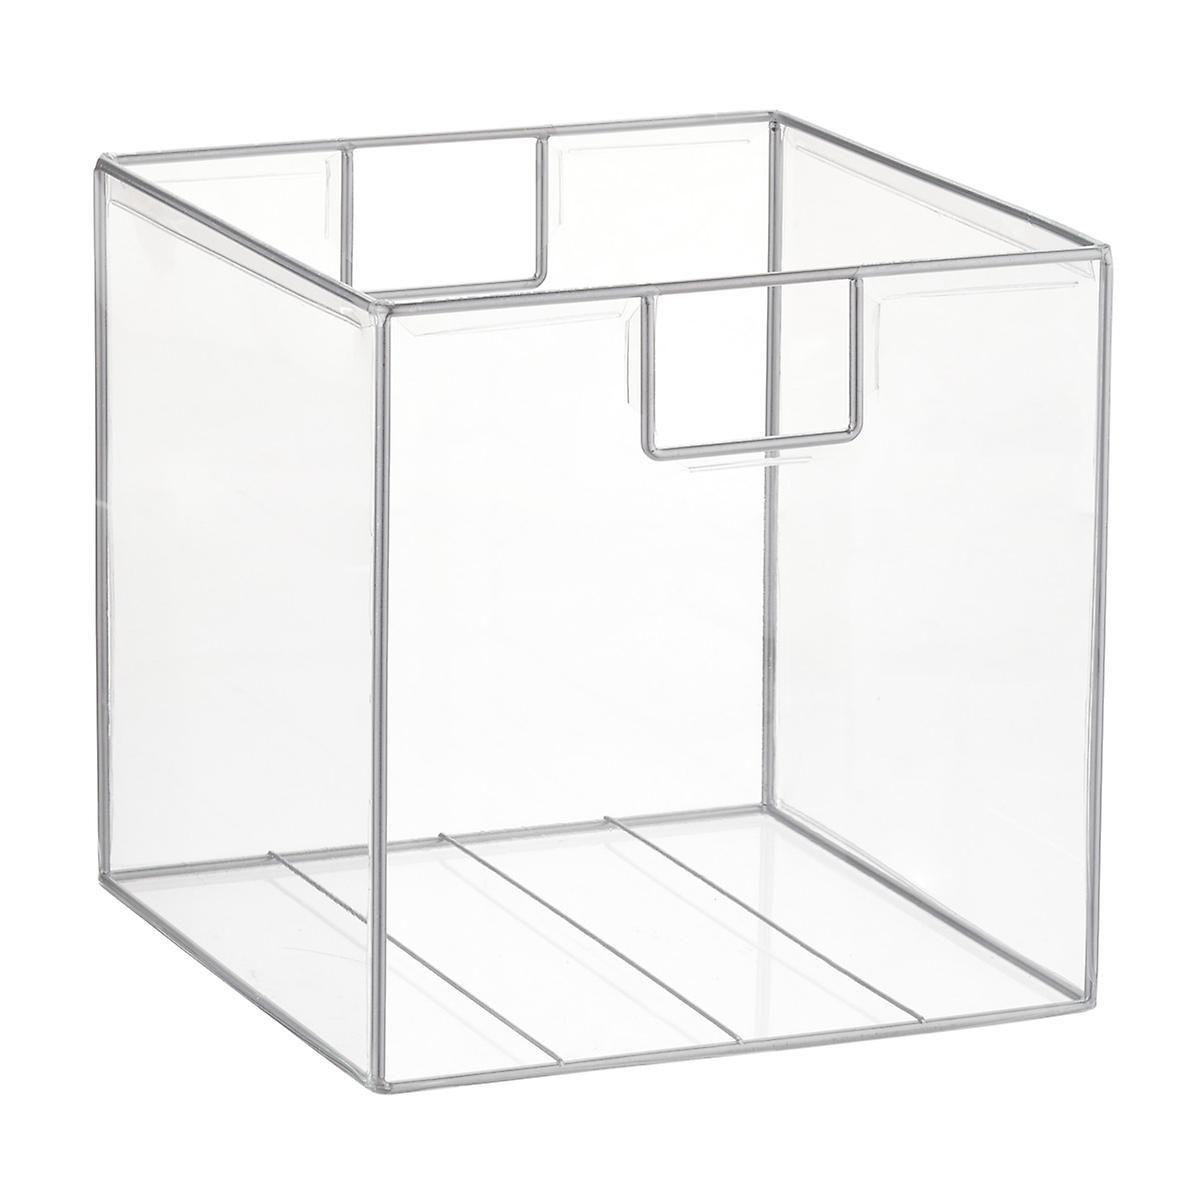 Clear Lookers Cubes Clear Storage Bins Cube Storage Bins Elfa Shelving